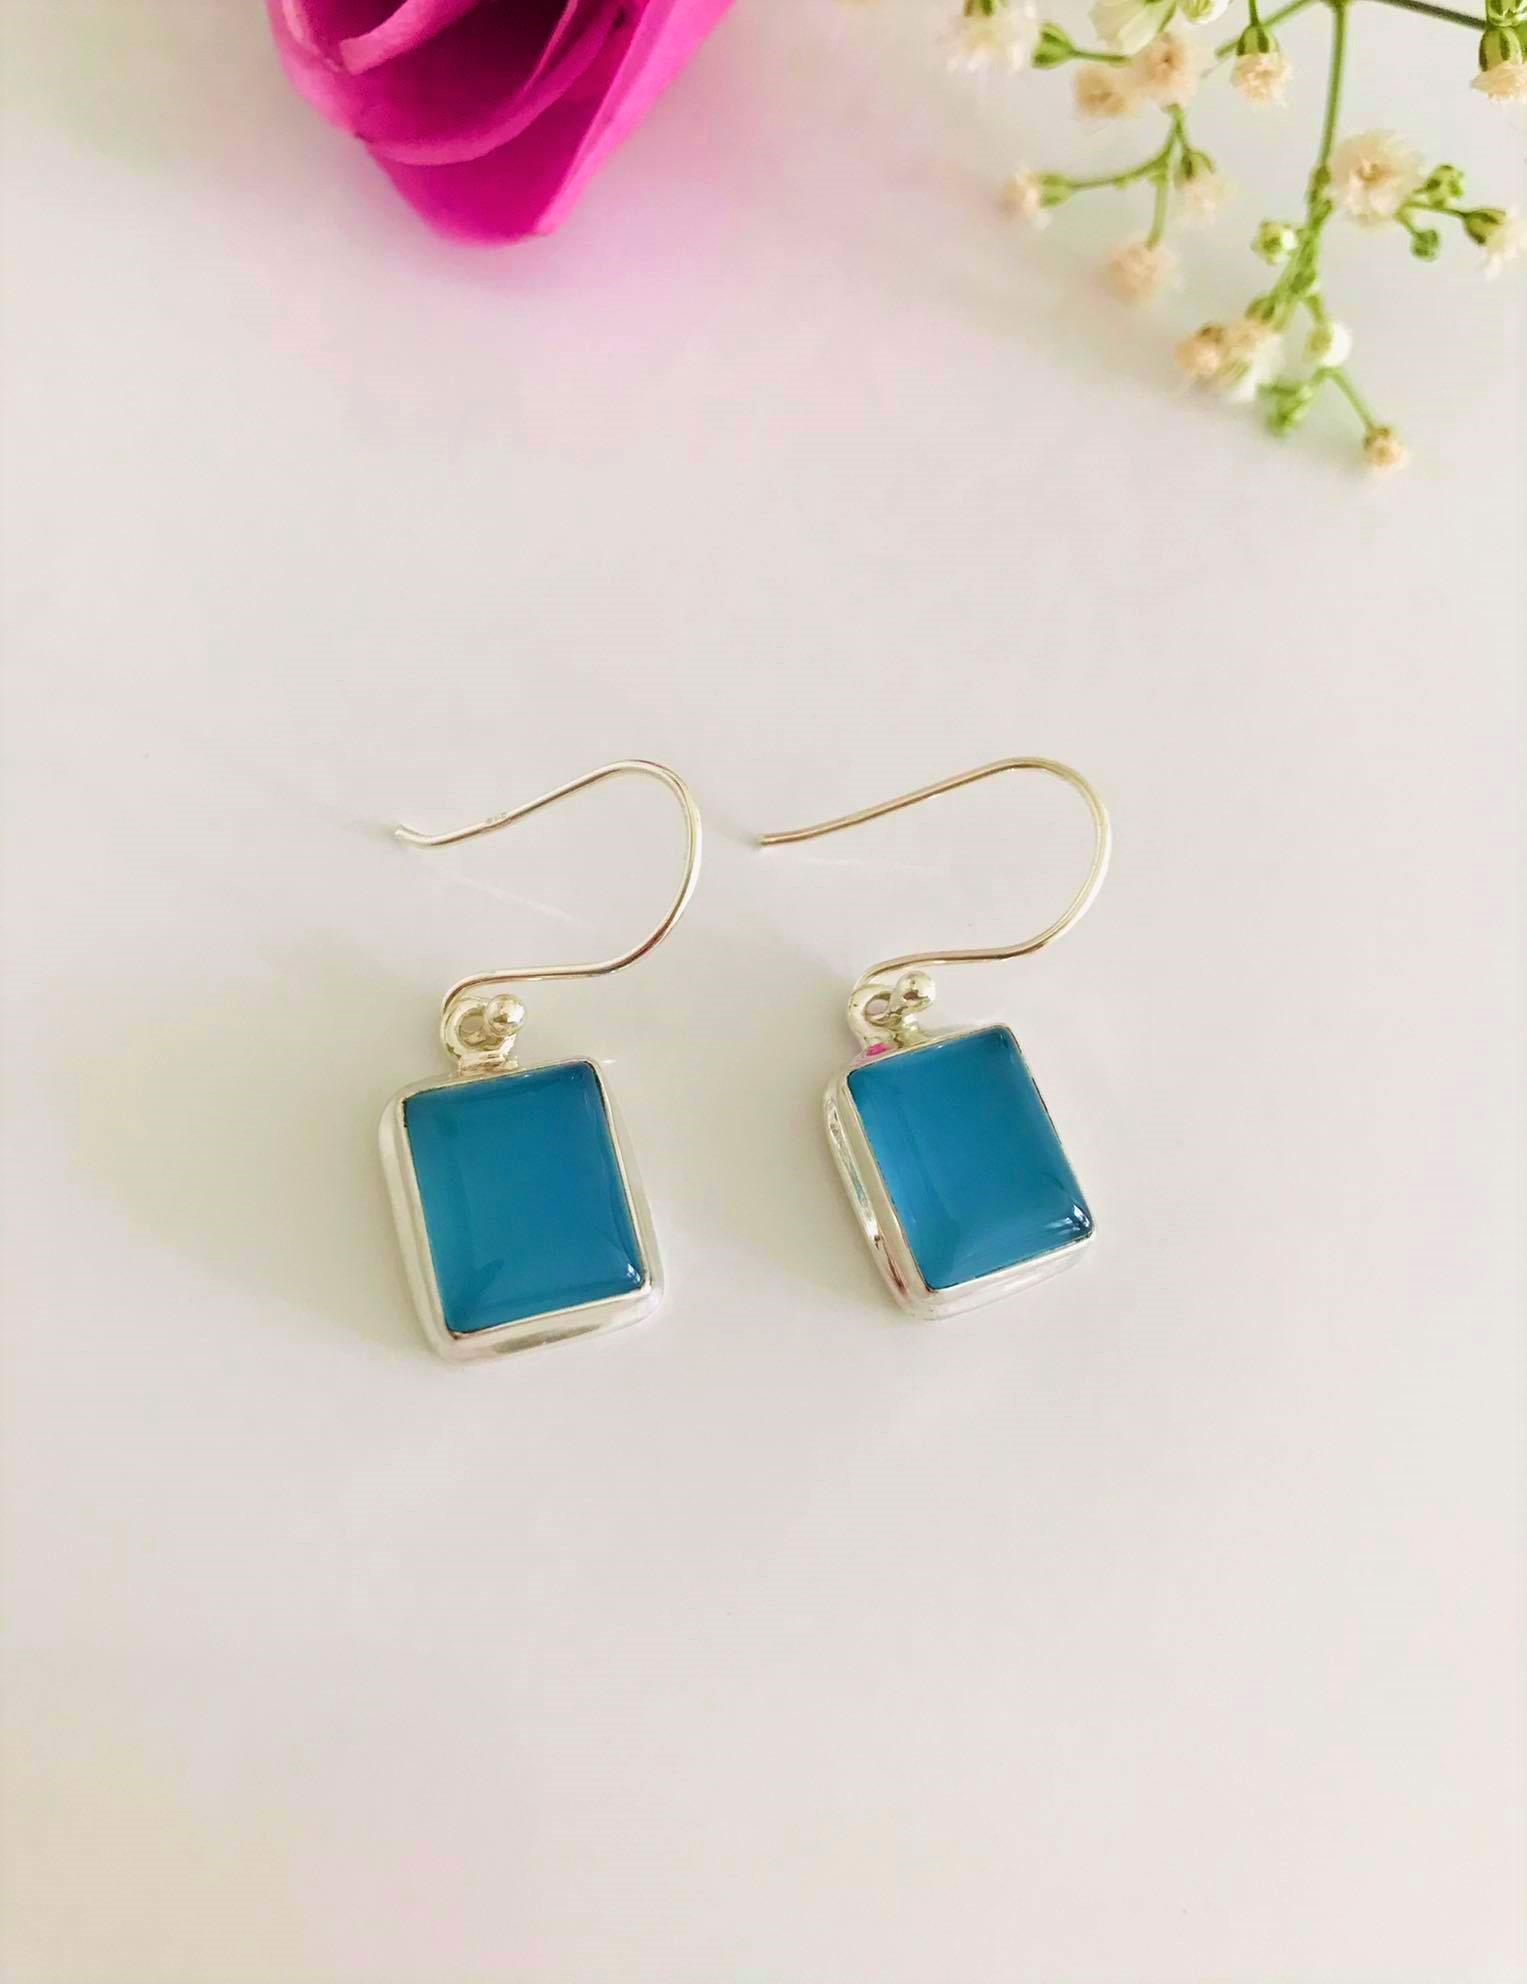 Blue Chalcedony set in Sterling Silver Earrings  Image